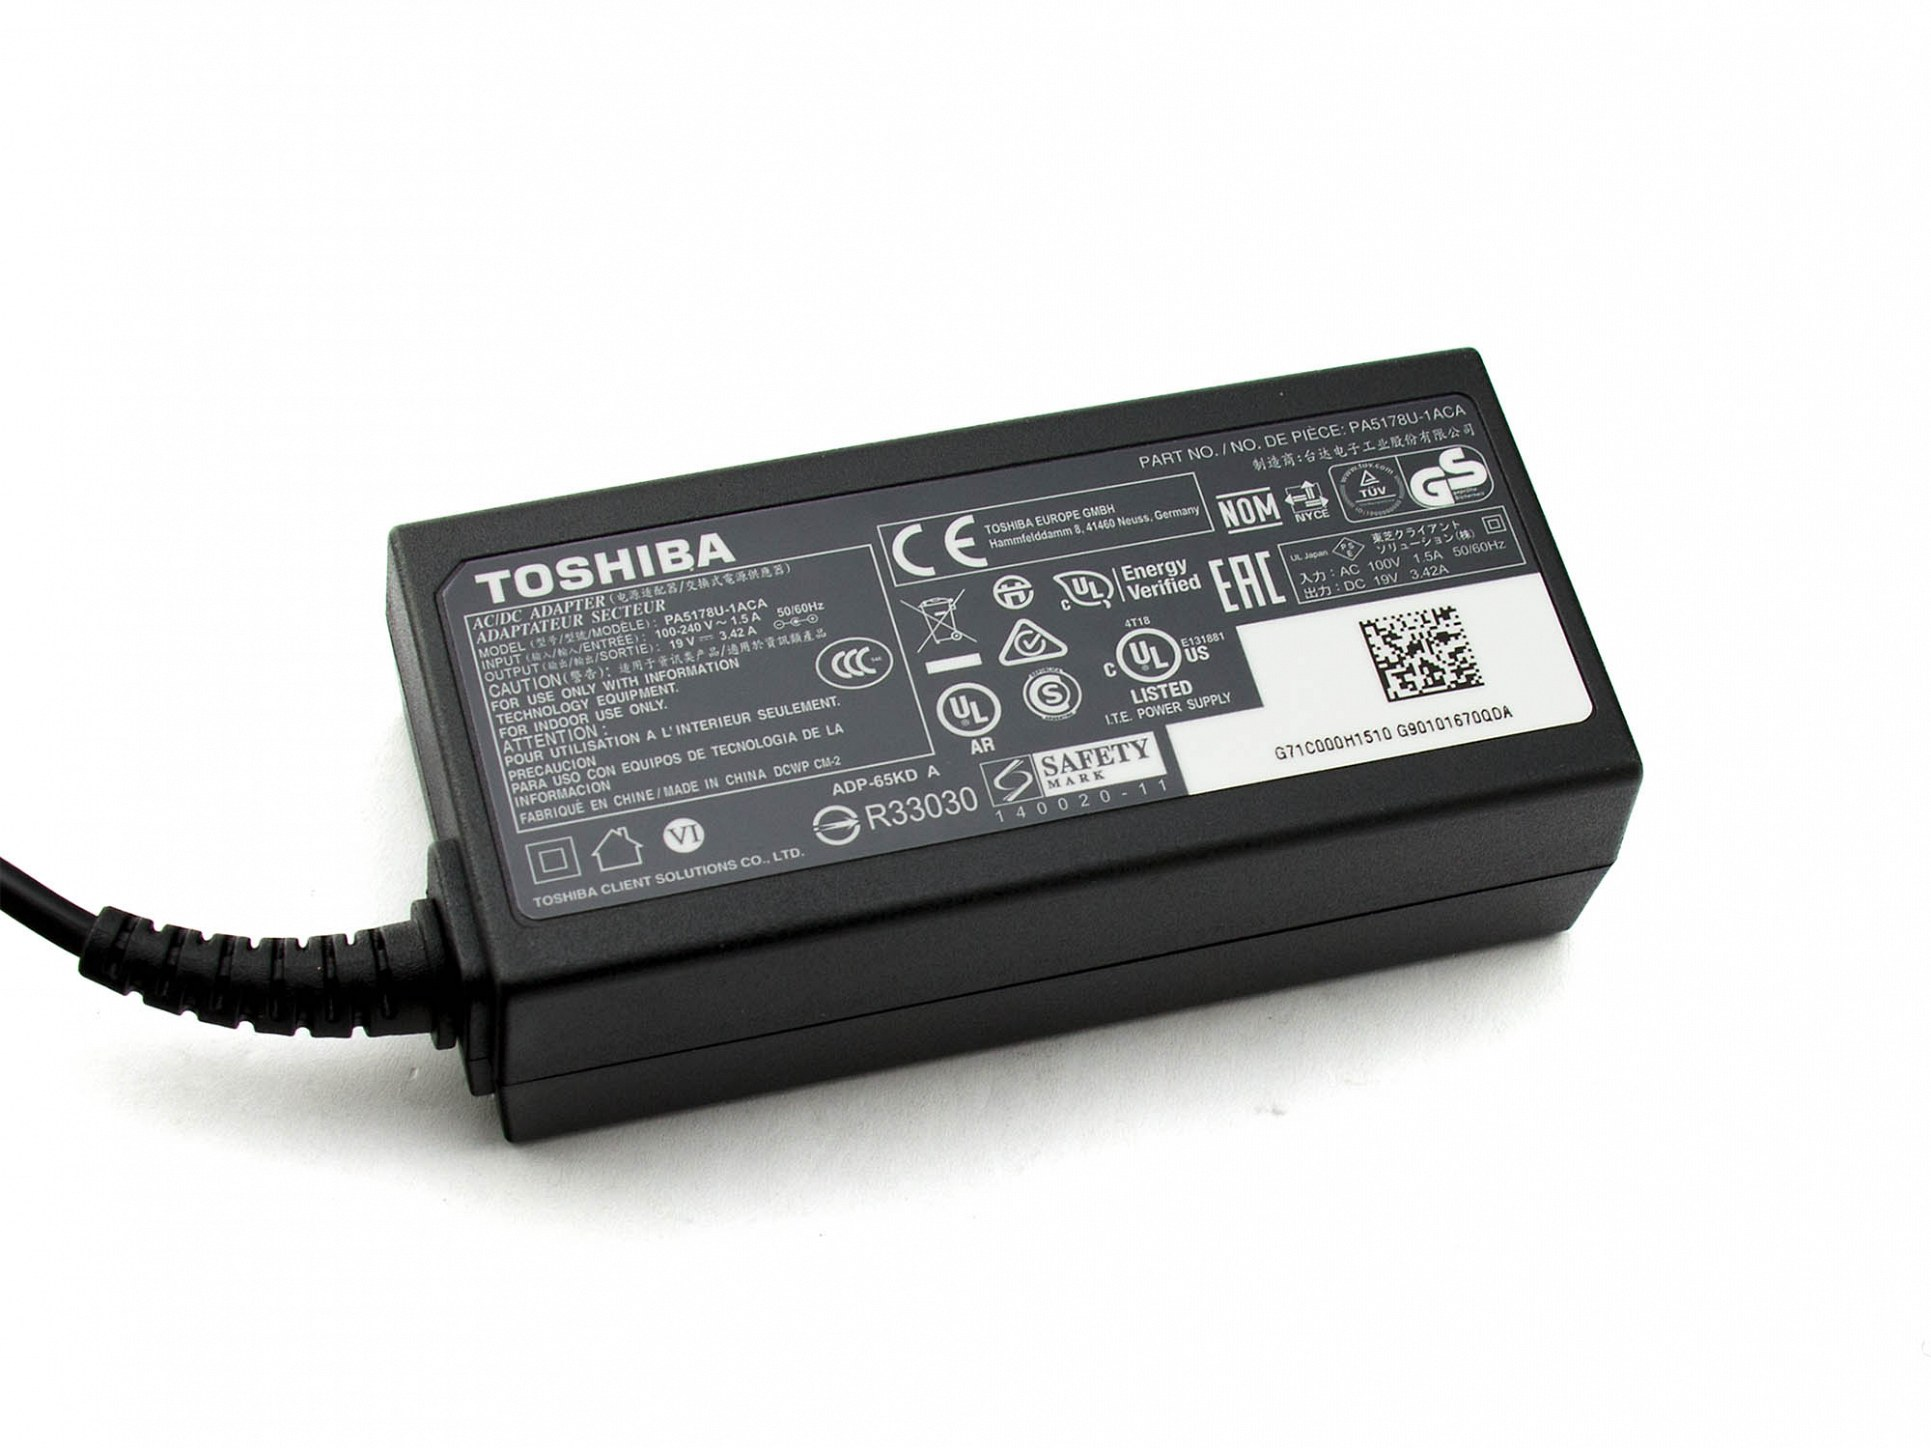 Netzteil Toshiba Satellite A500-19N